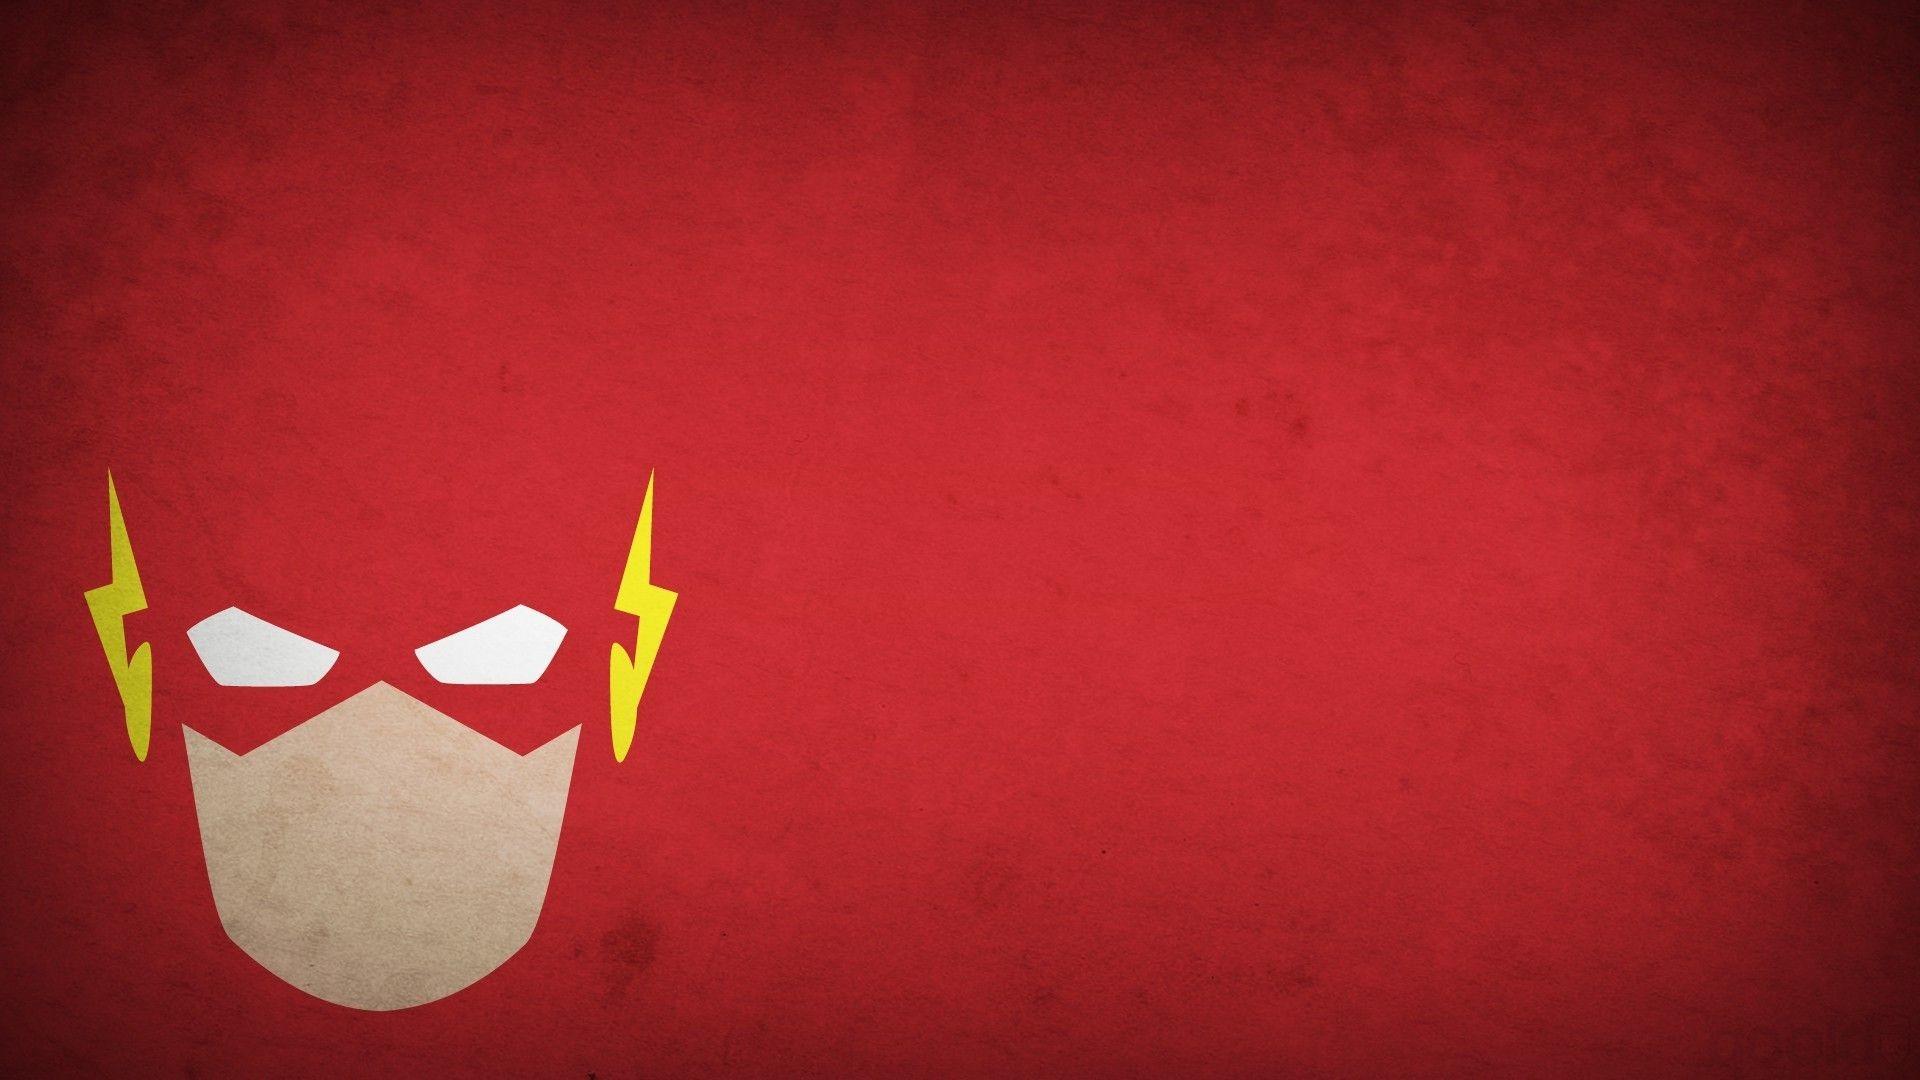 simple Background, Comics, DC Comics, Heroes, Flash, …